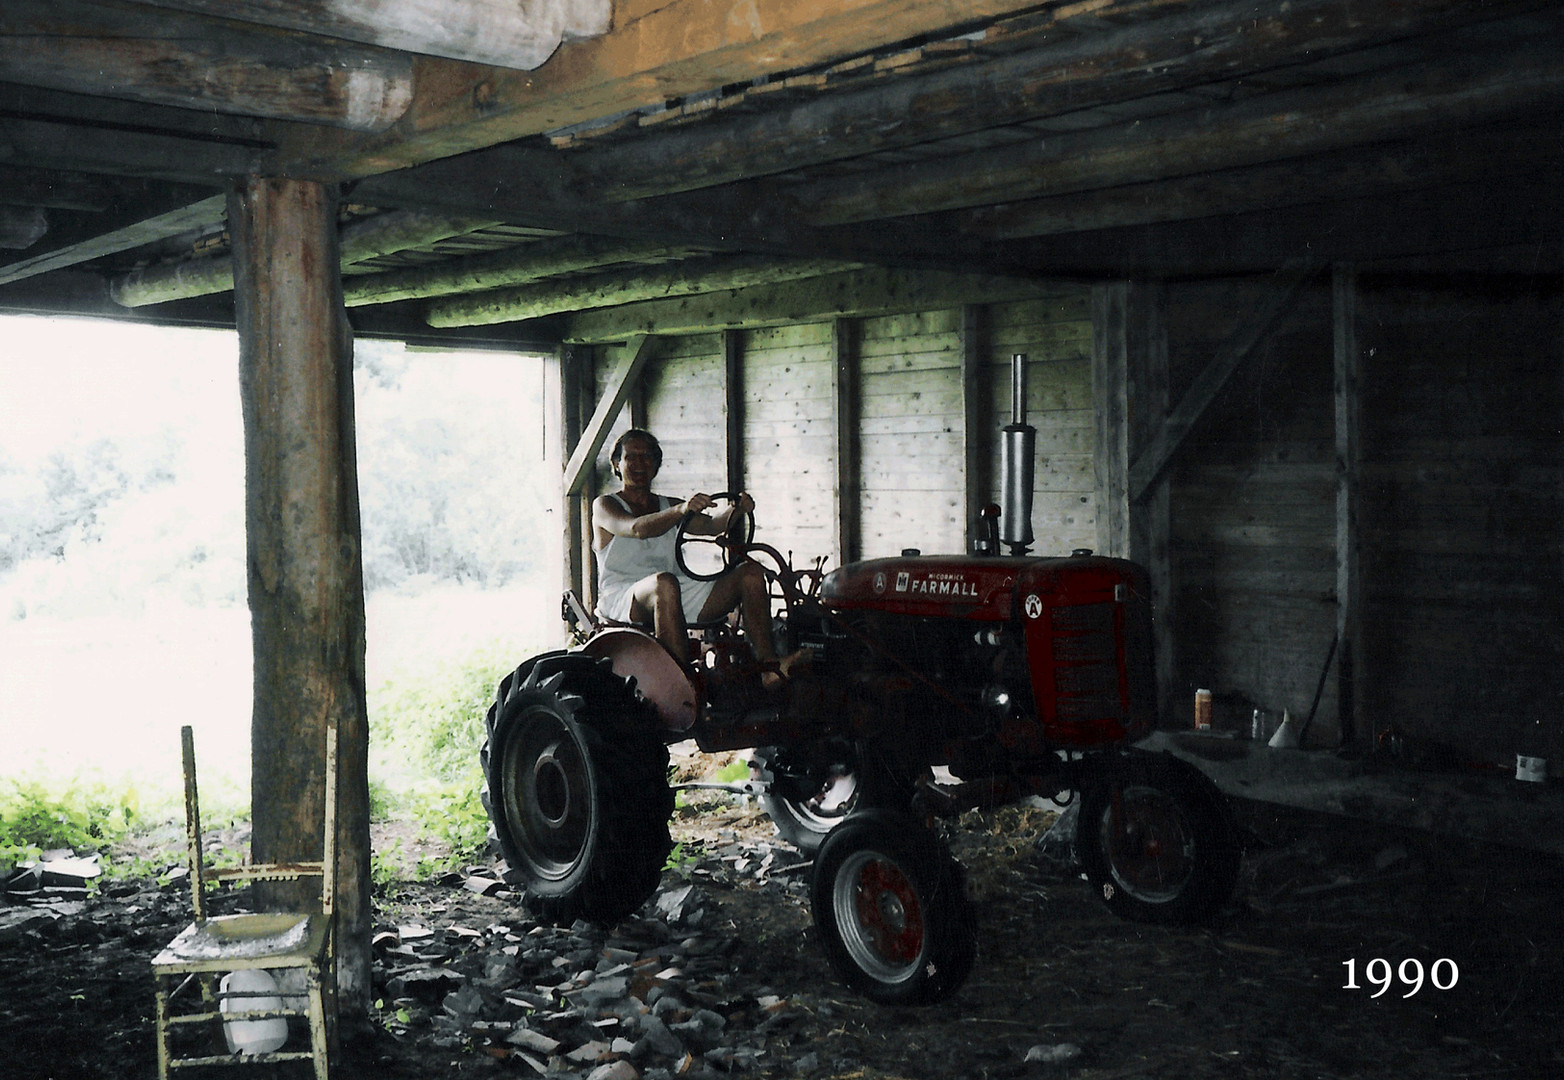 1990Tractor-in-Barn copy.jpg